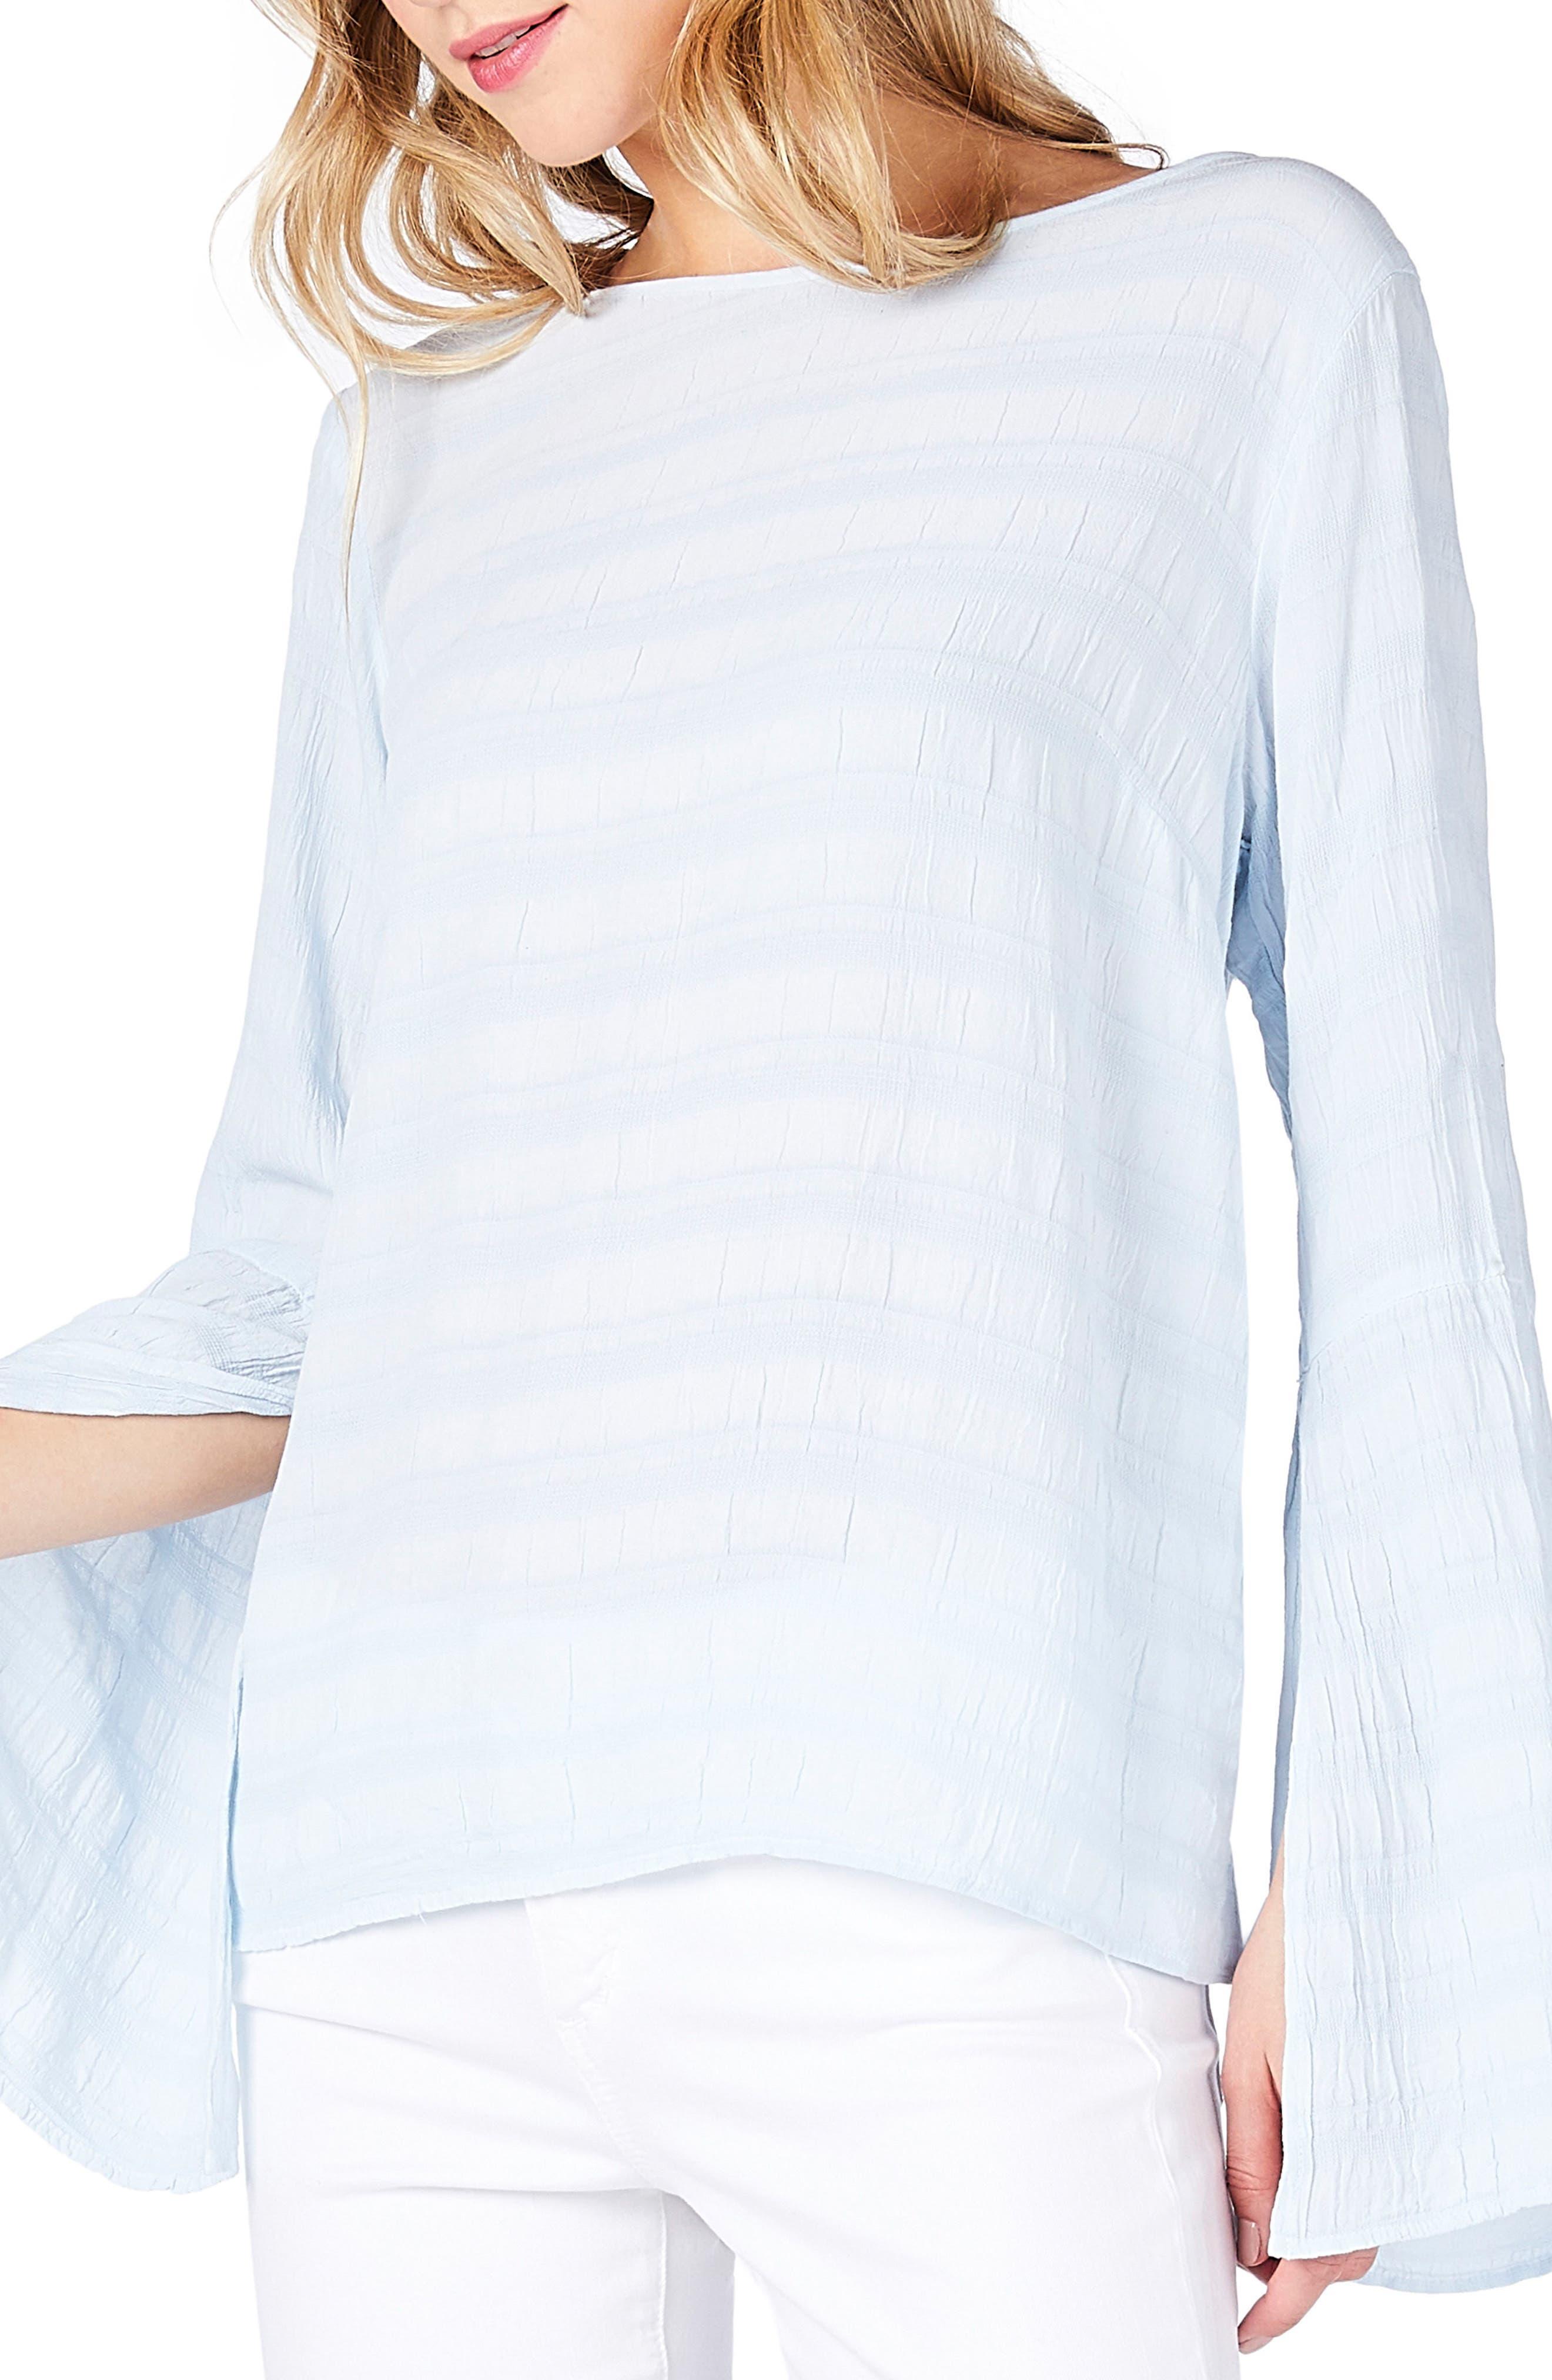 Slit Bell Sleeve Top,                             Alternate thumbnail 2, color,                             Sea Glass